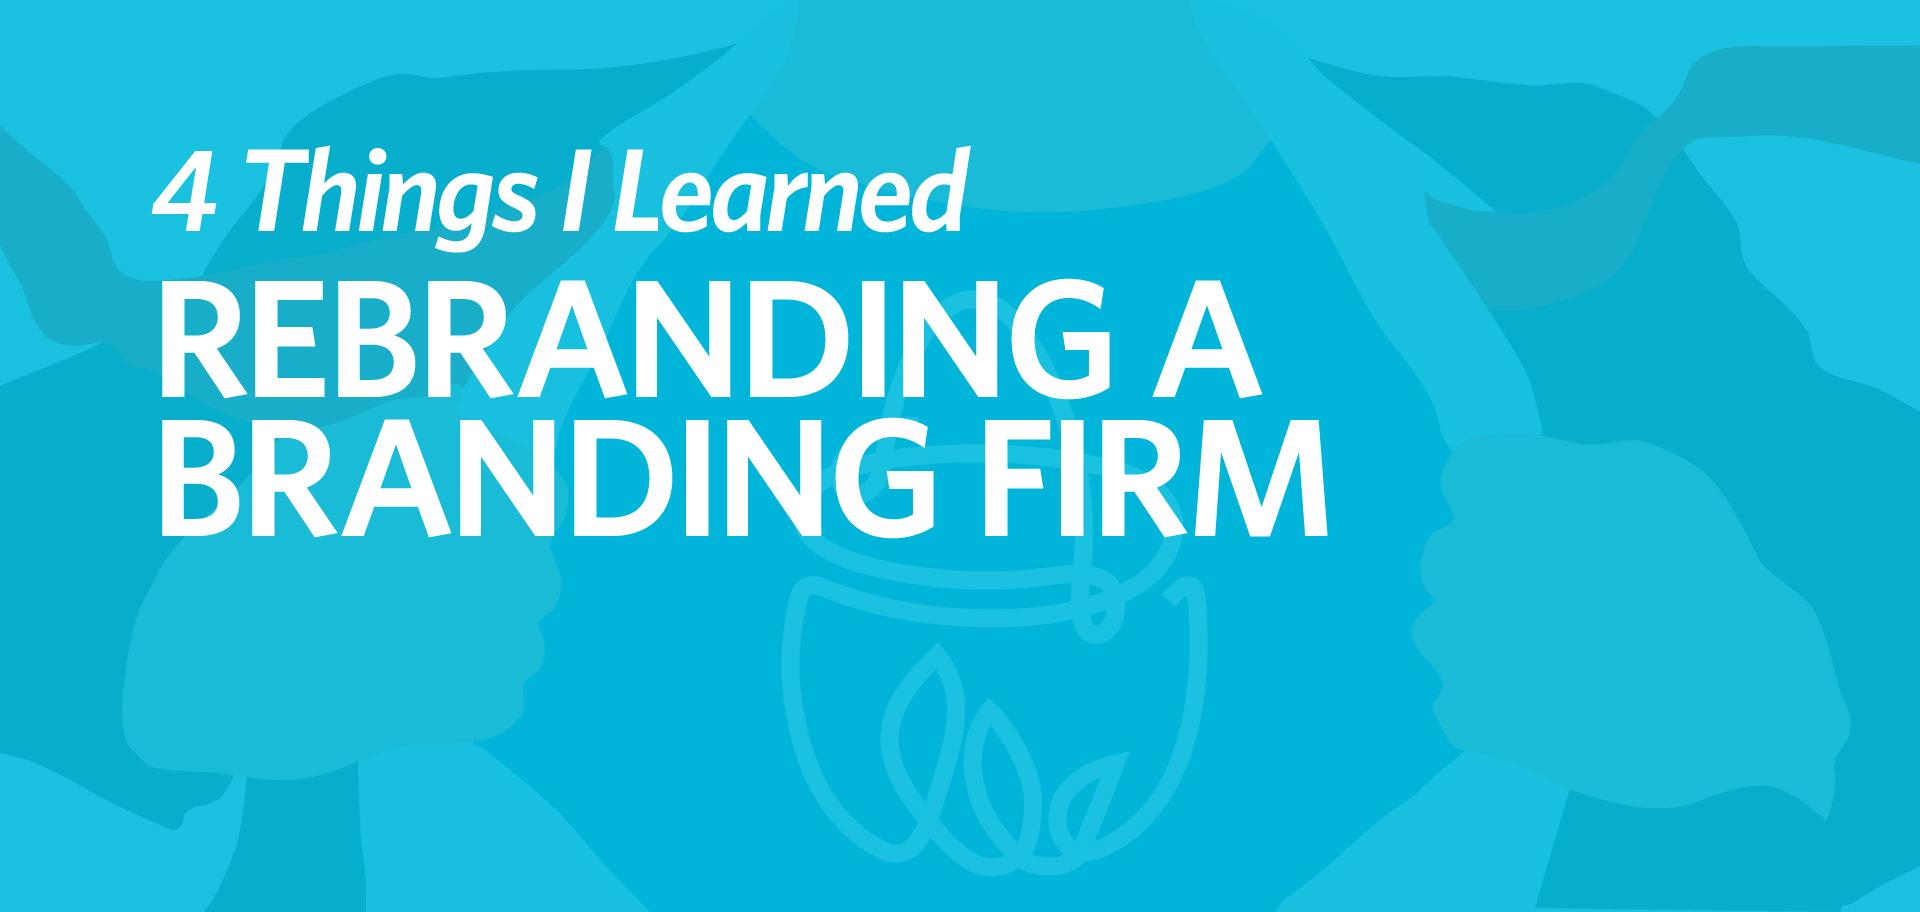 4 things I learned rebranding a branding firm Kettle Fire Creative guide to rebranding rebrand 4 Things I Learned Rebranding a Branding Firm rebranding a branding firm fi